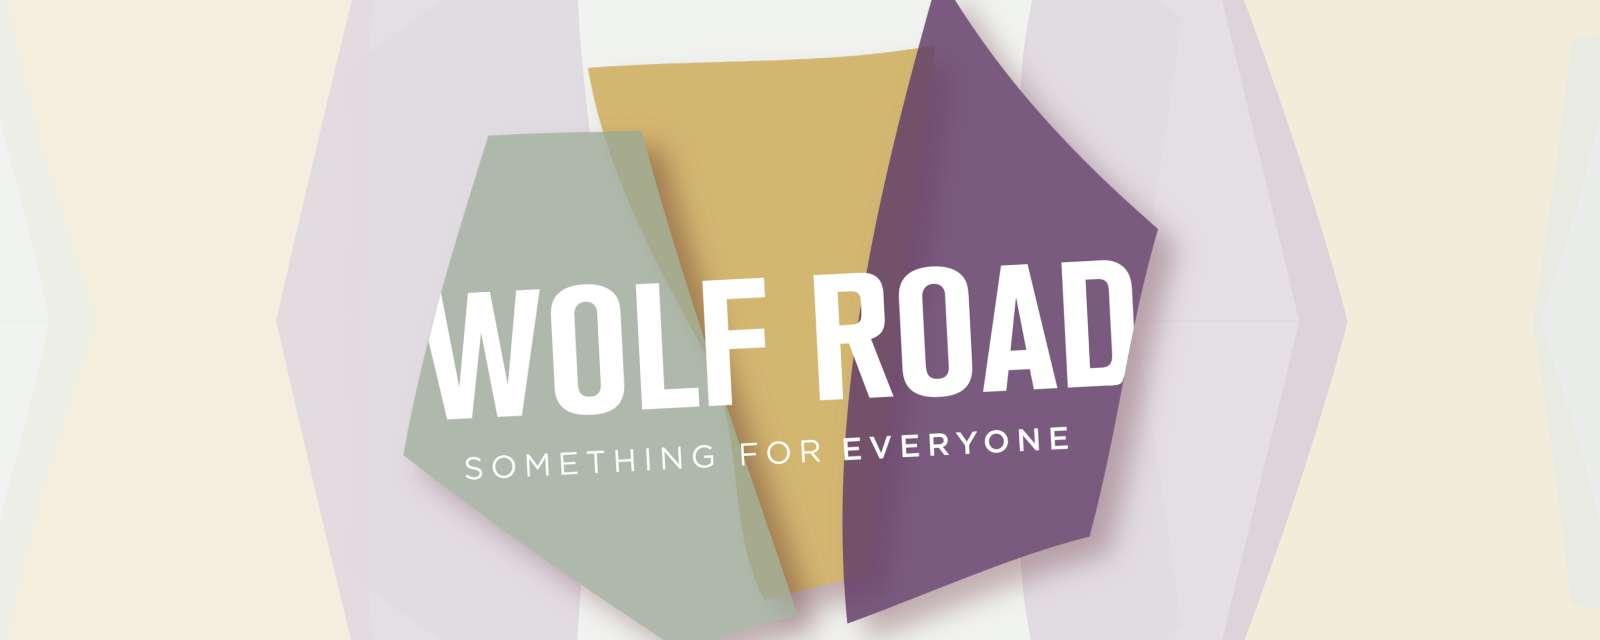 Wolf Road logo